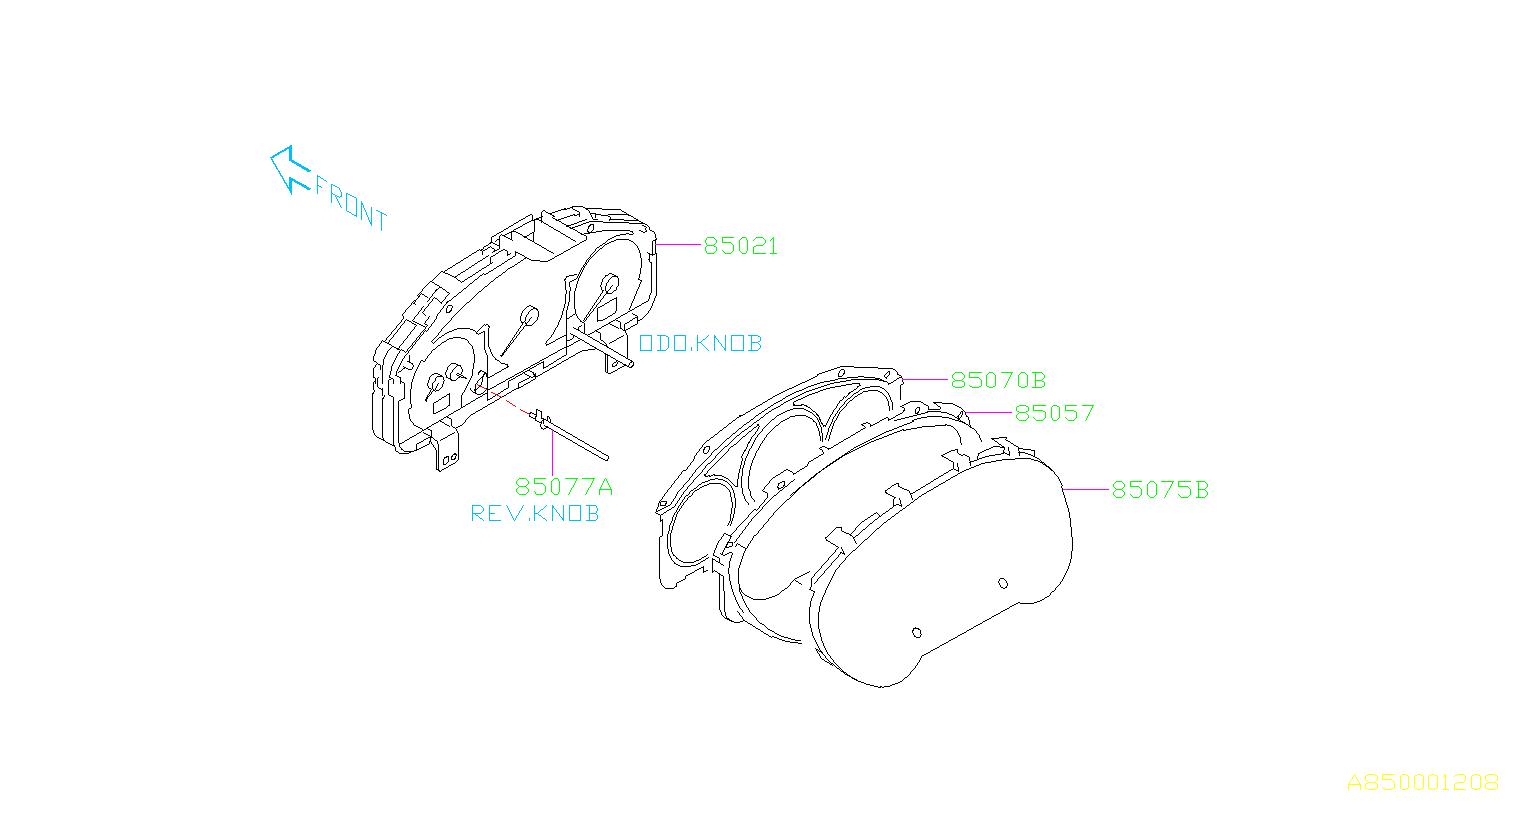 Subaru Impreza Knob kit-combination meter. Exc, electrical